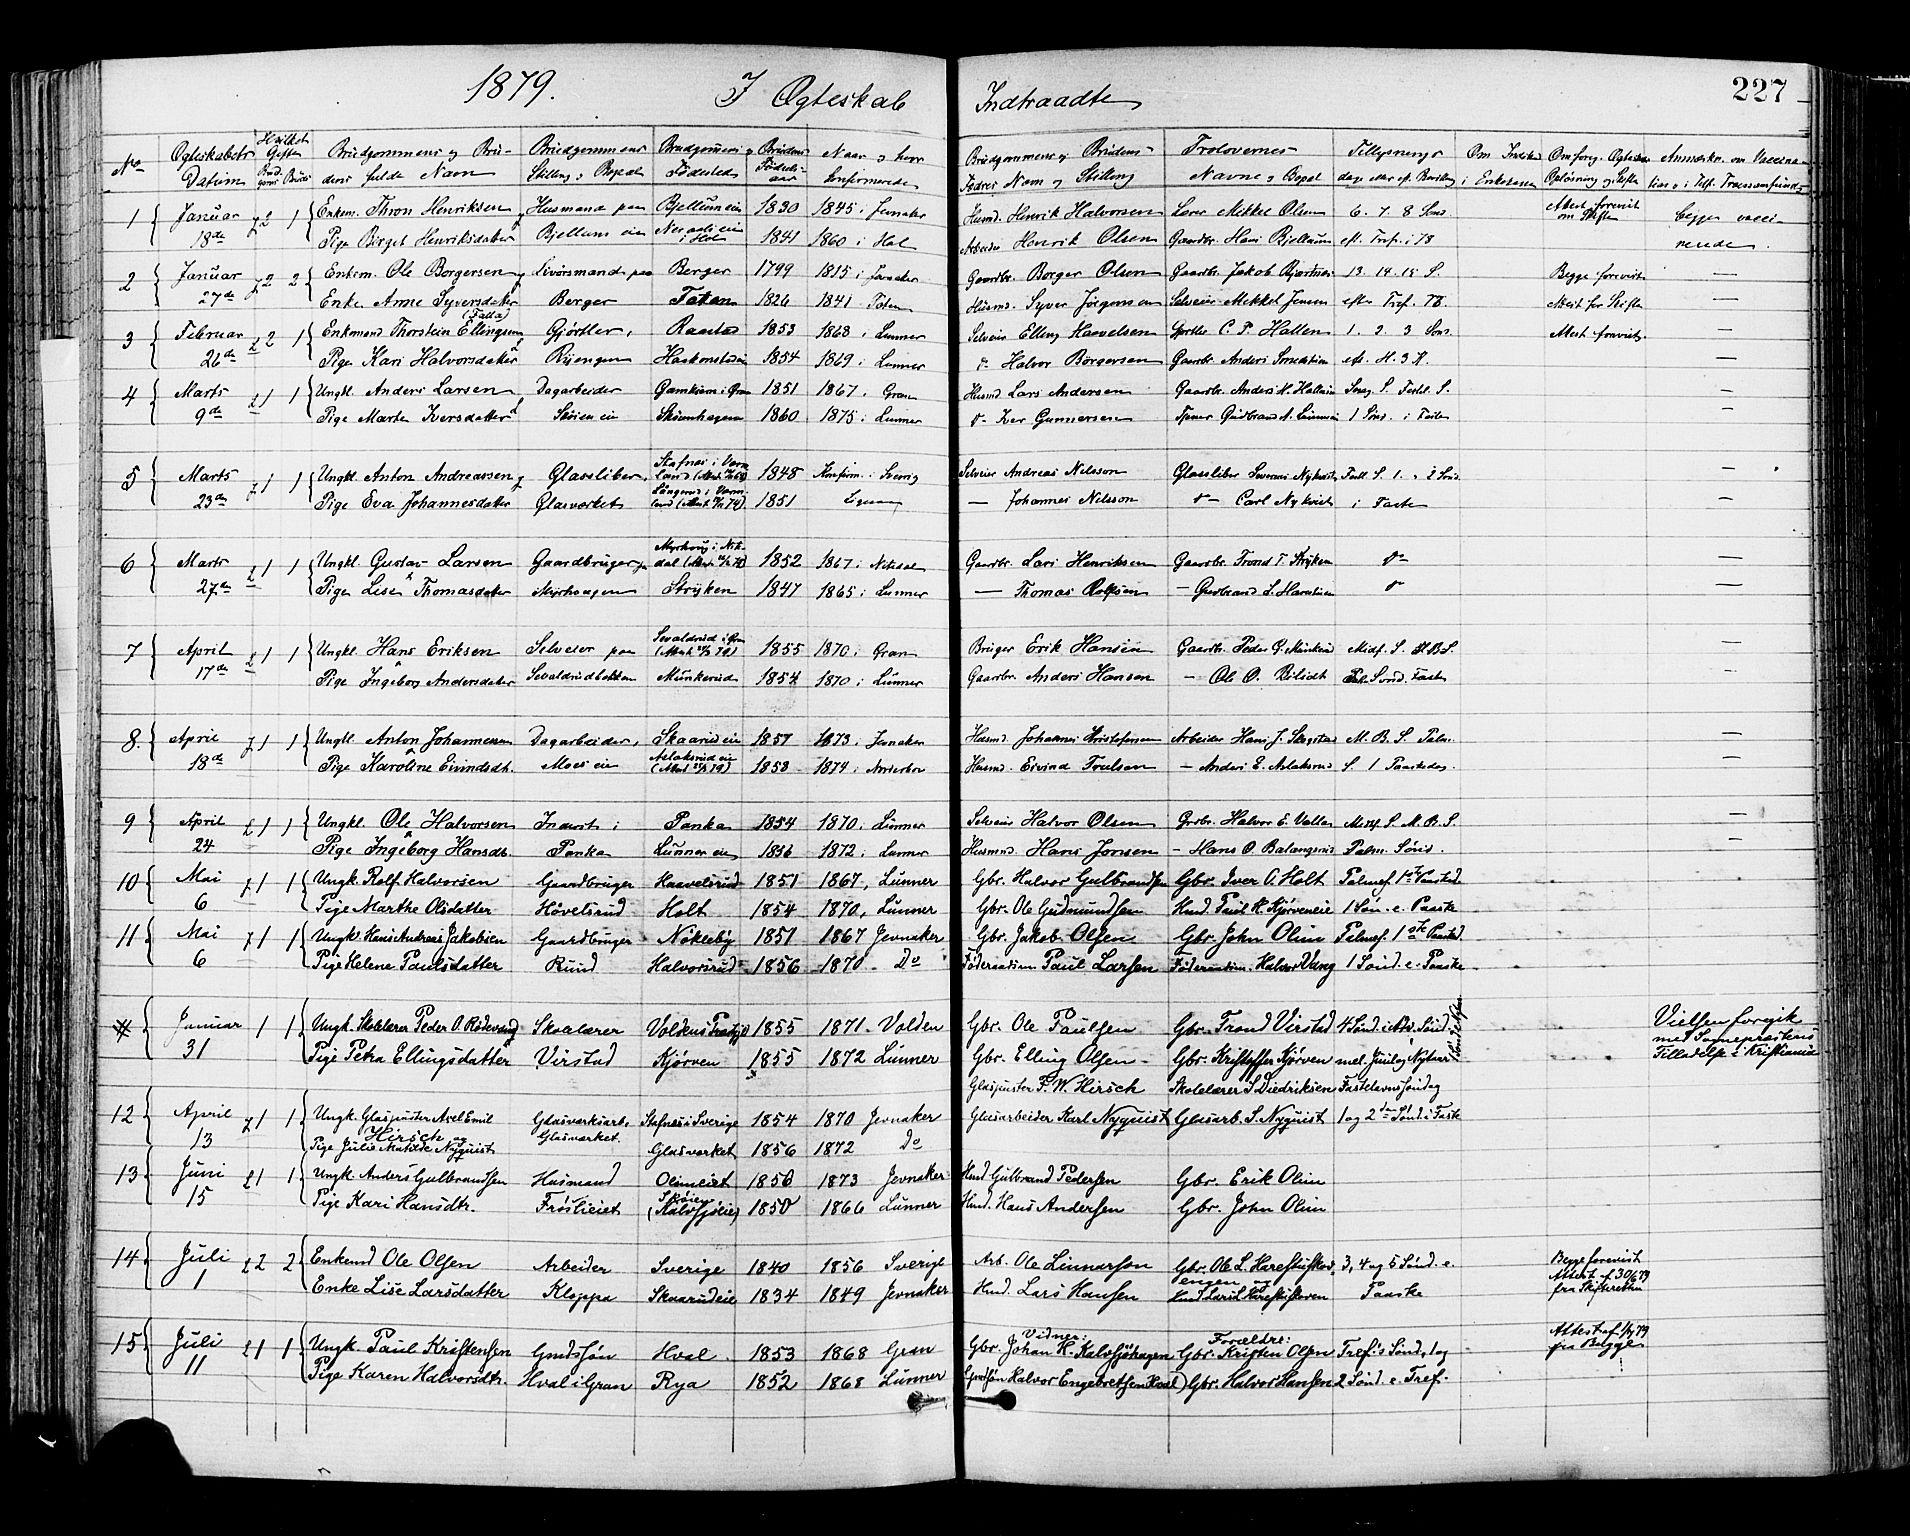 SAH, Jevnaker prestekontor, Ministerialbok nr. 8, 1877-1890, s. 227